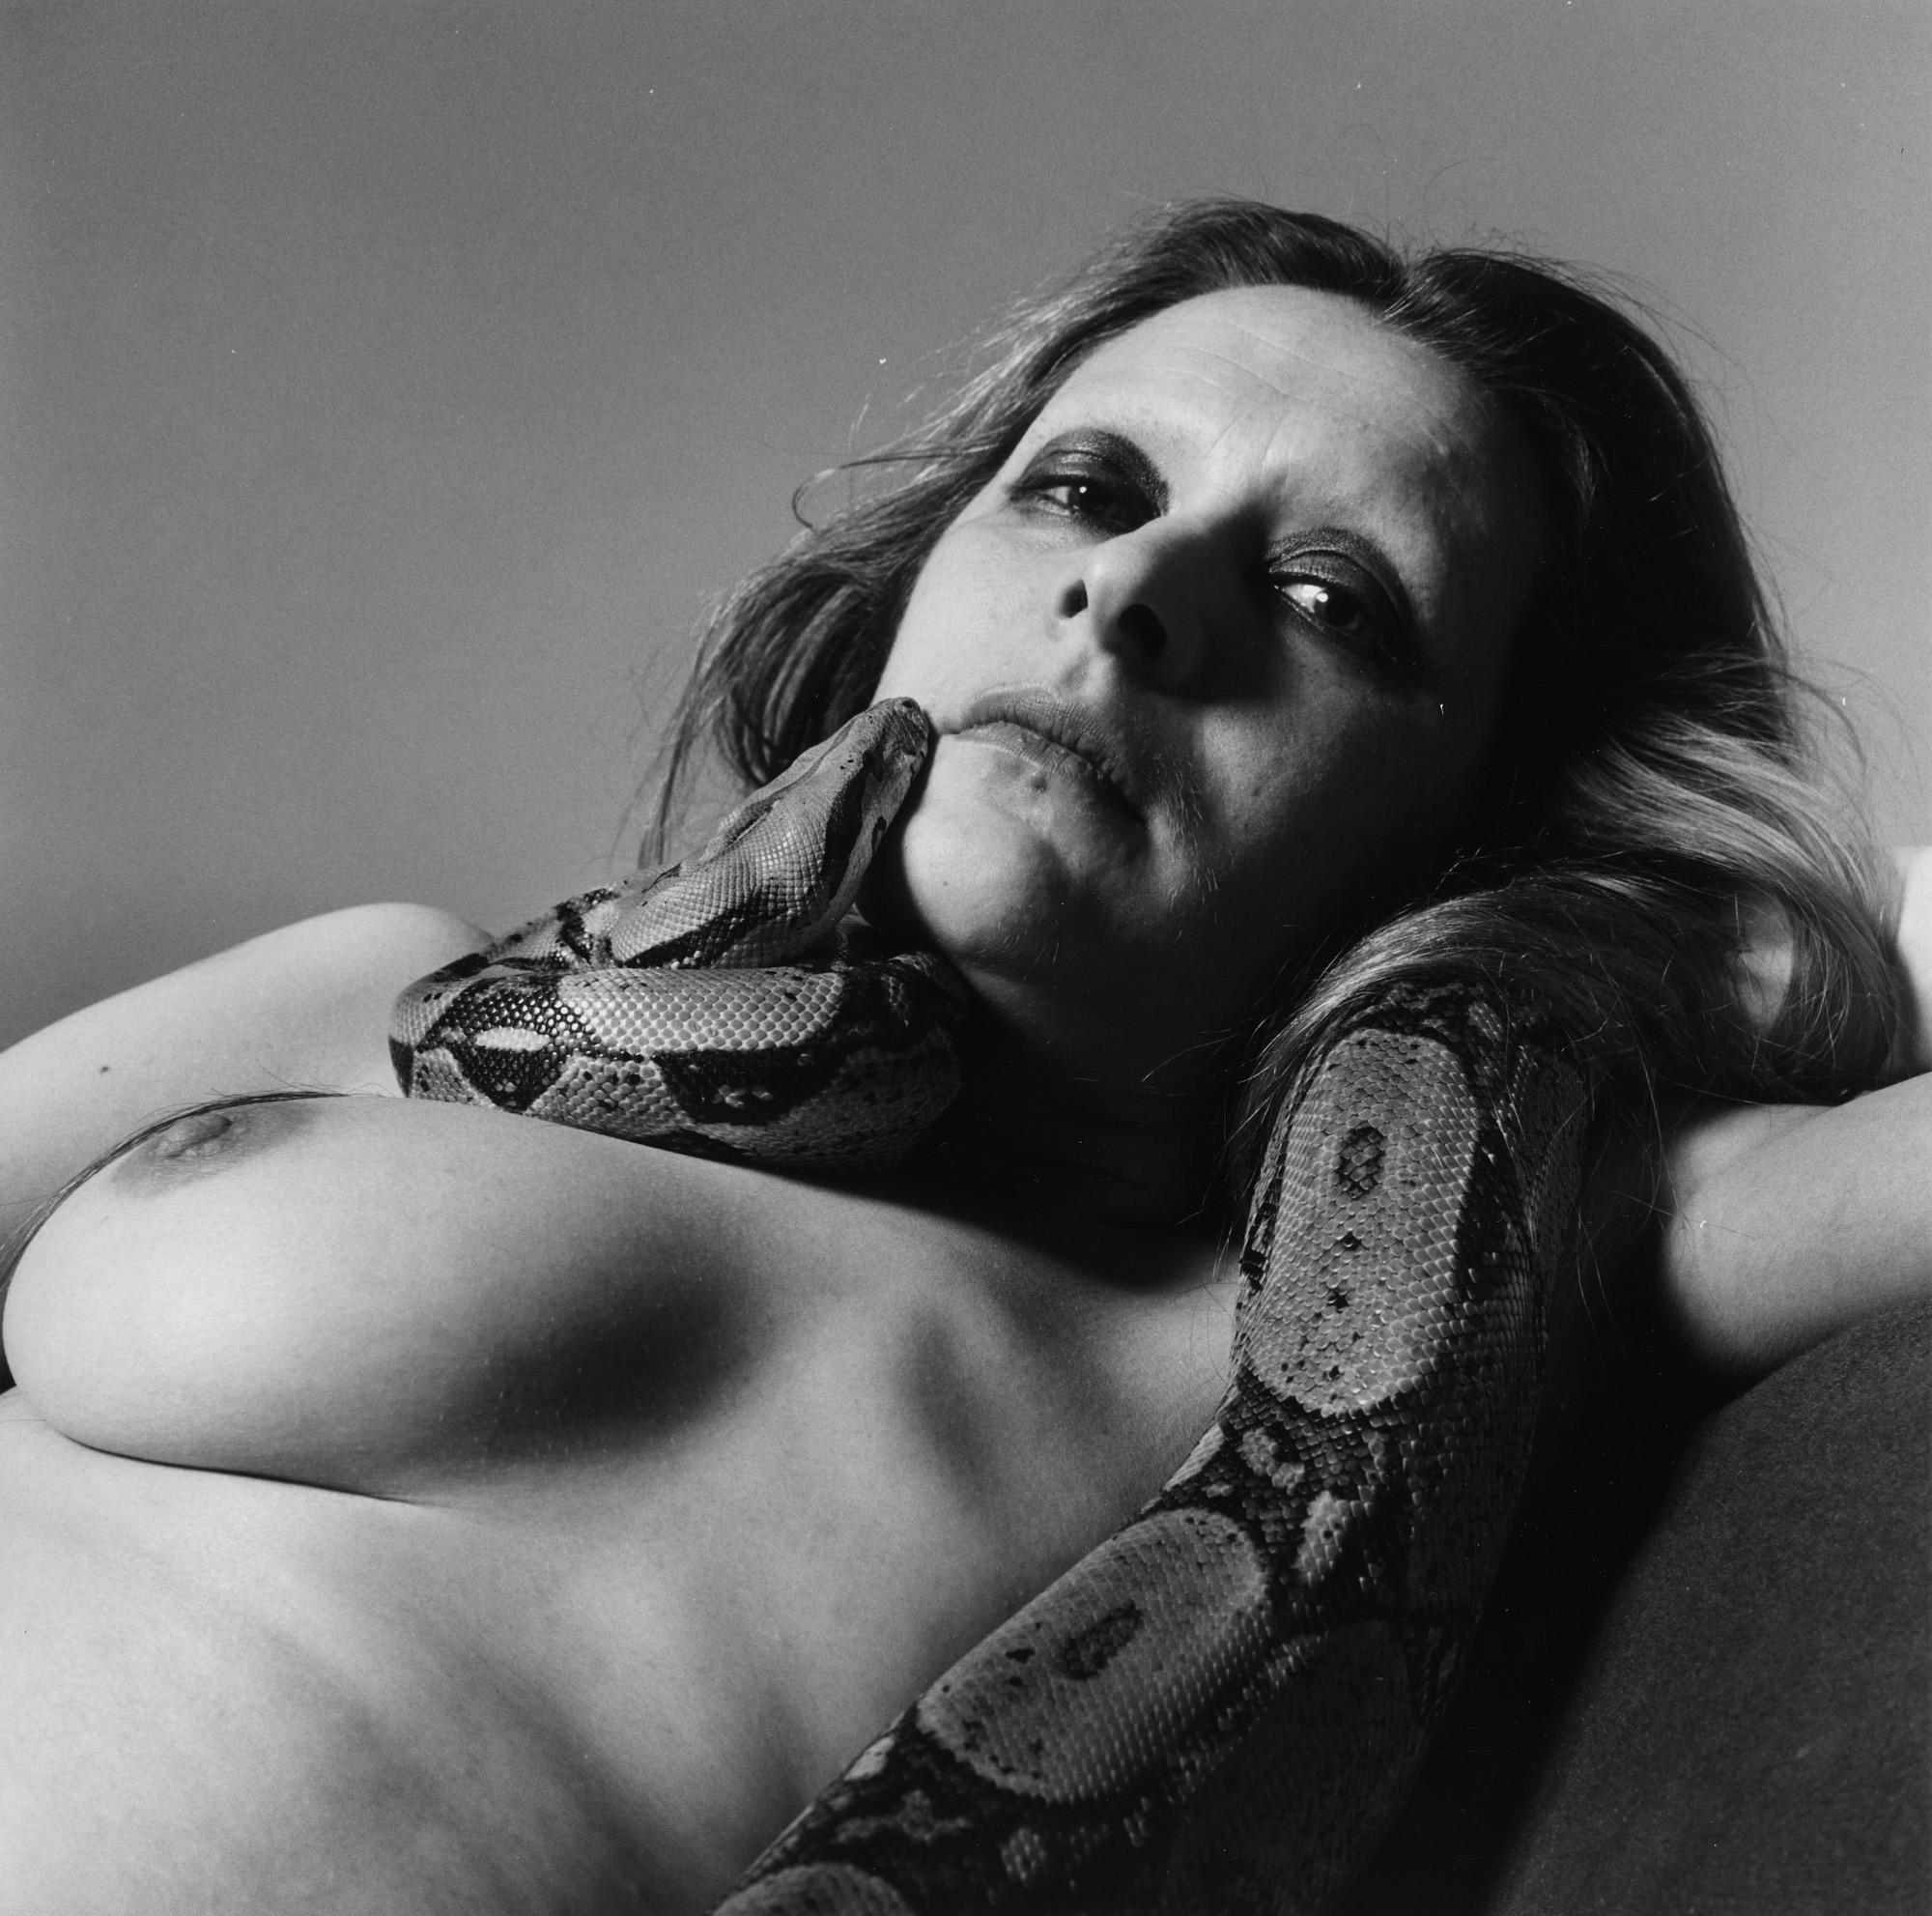 Fotó: Peter Hujar: Sarah Jenkins with Skippy (II), 1985 © Peter Hujar Archive / Fraenkel Gallery